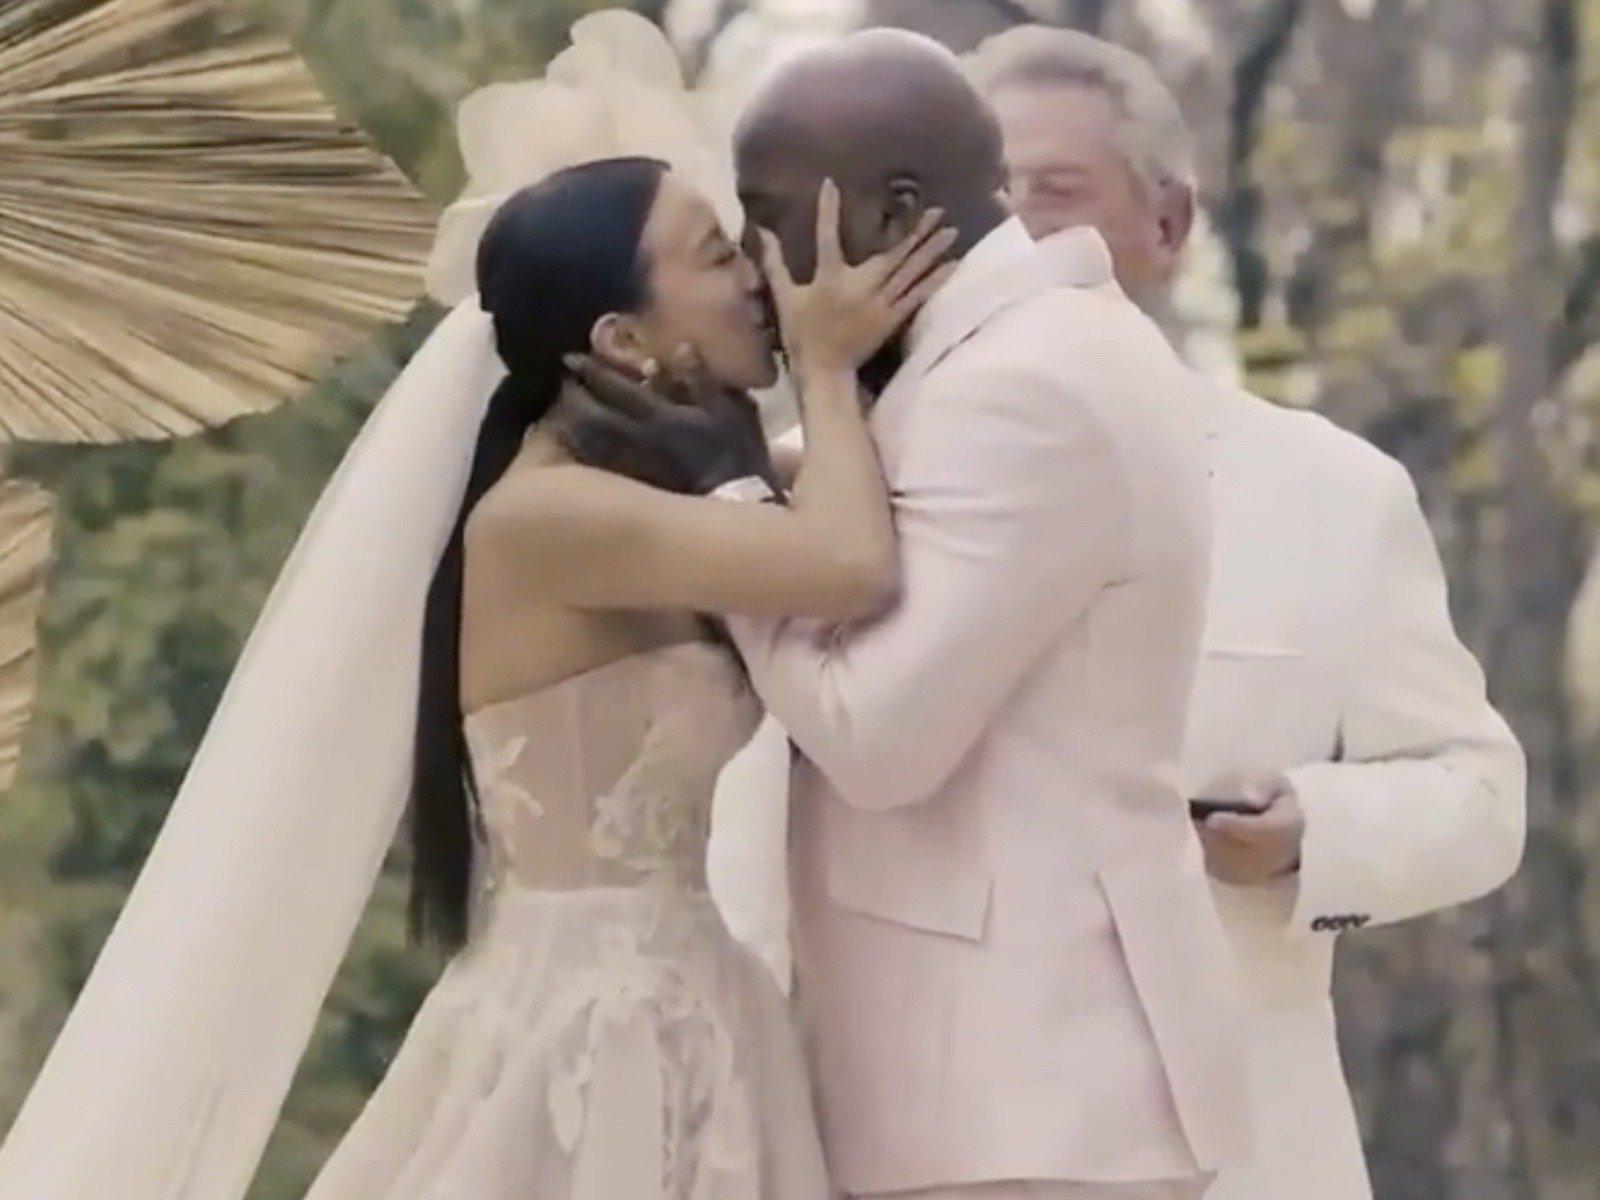 Jeezy Shares Super Emotional Jeannie Mai Wedding Video 4